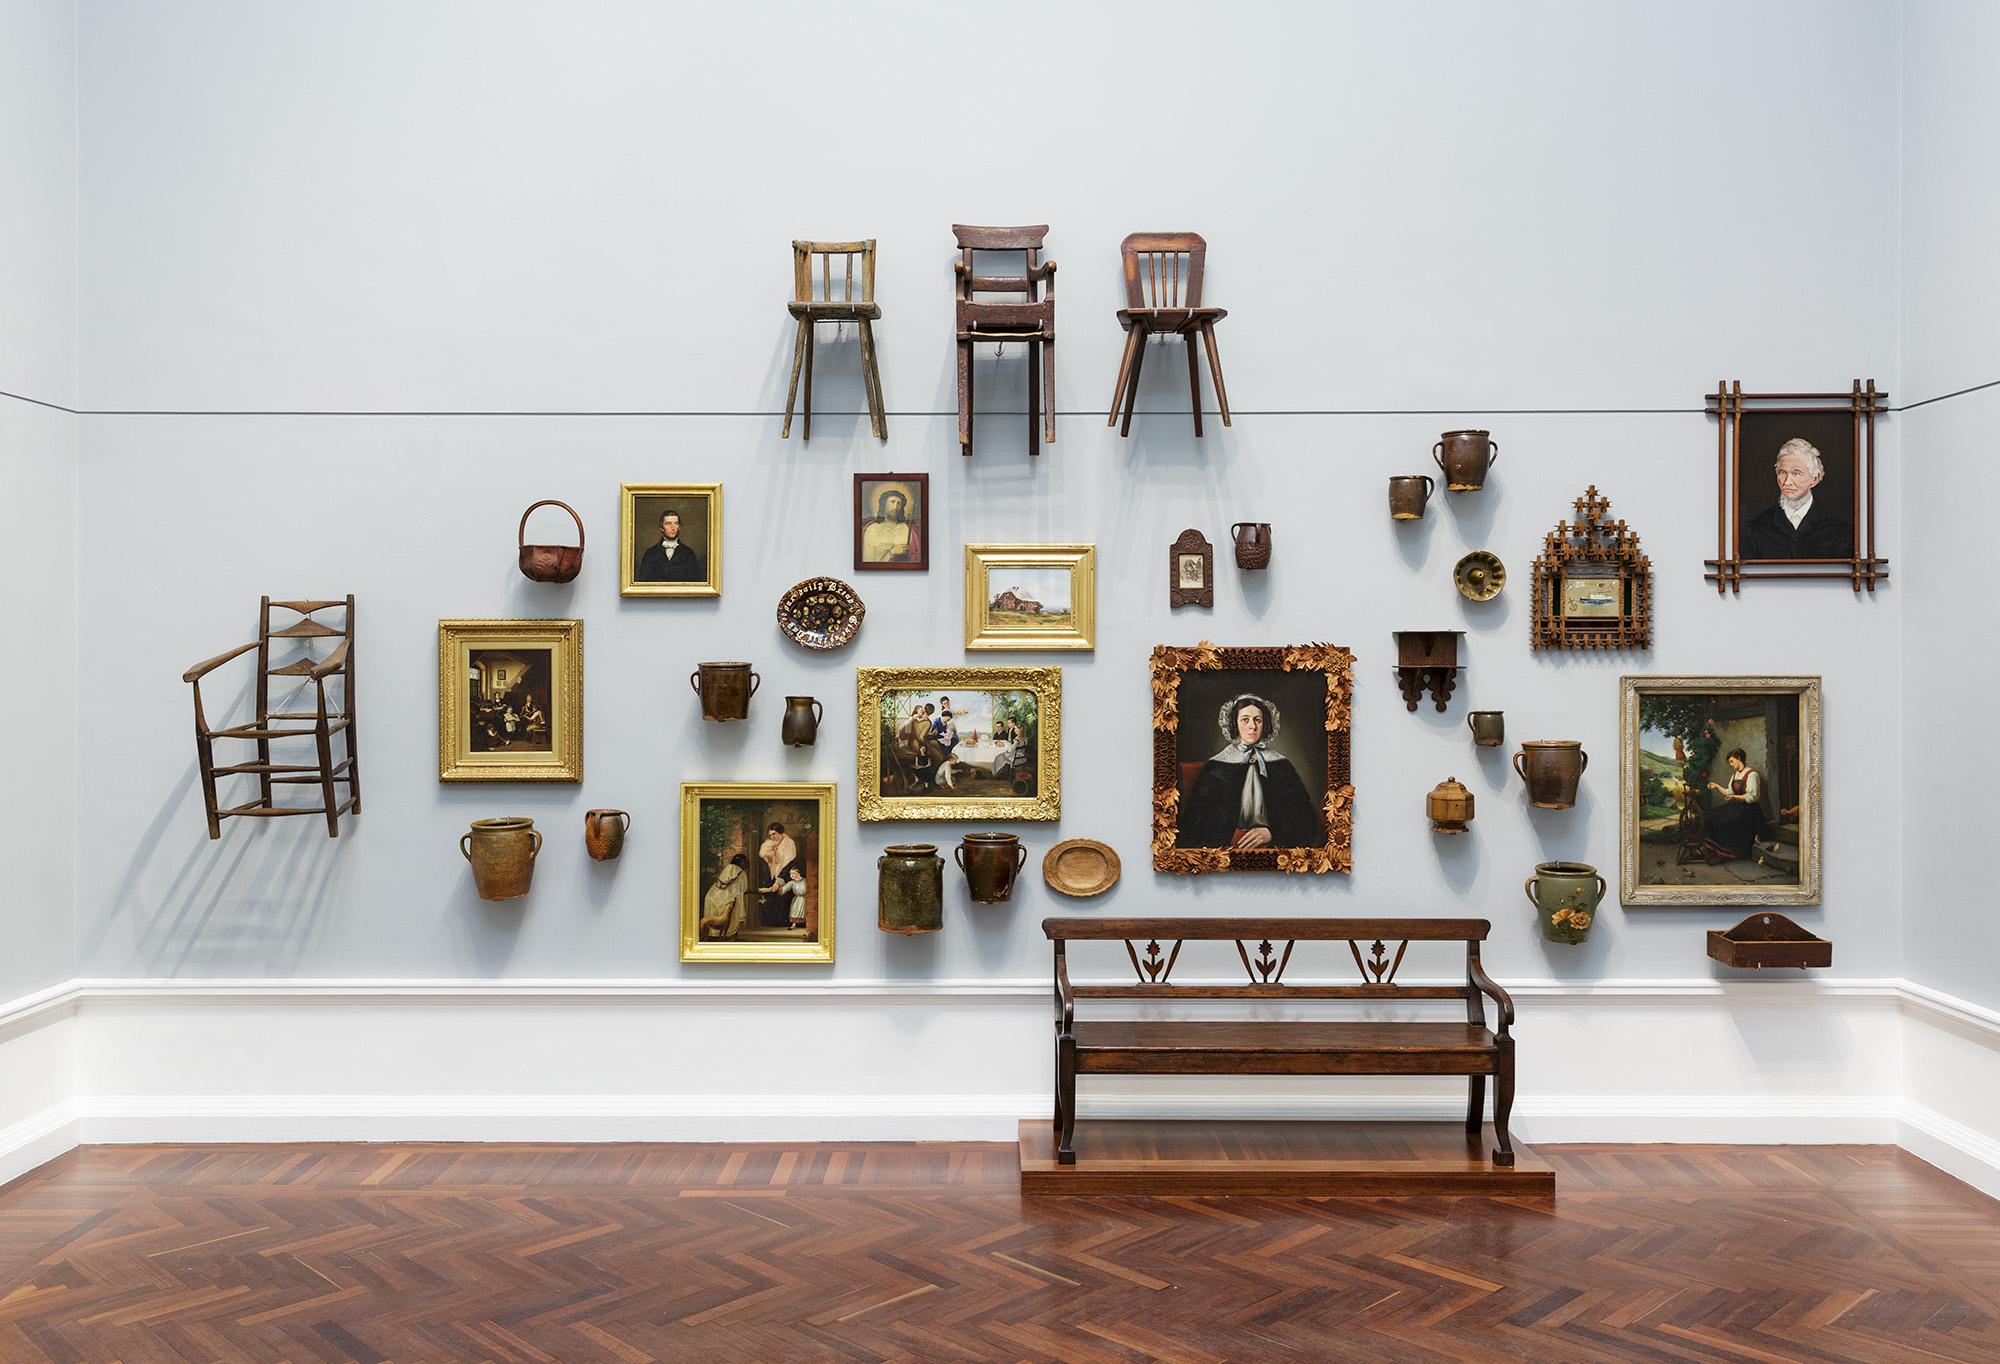 Installation view: Elder Wing of Australian Art, Art Gallery of South Australia, Adelaide, 2018; photo: Saul Steed.